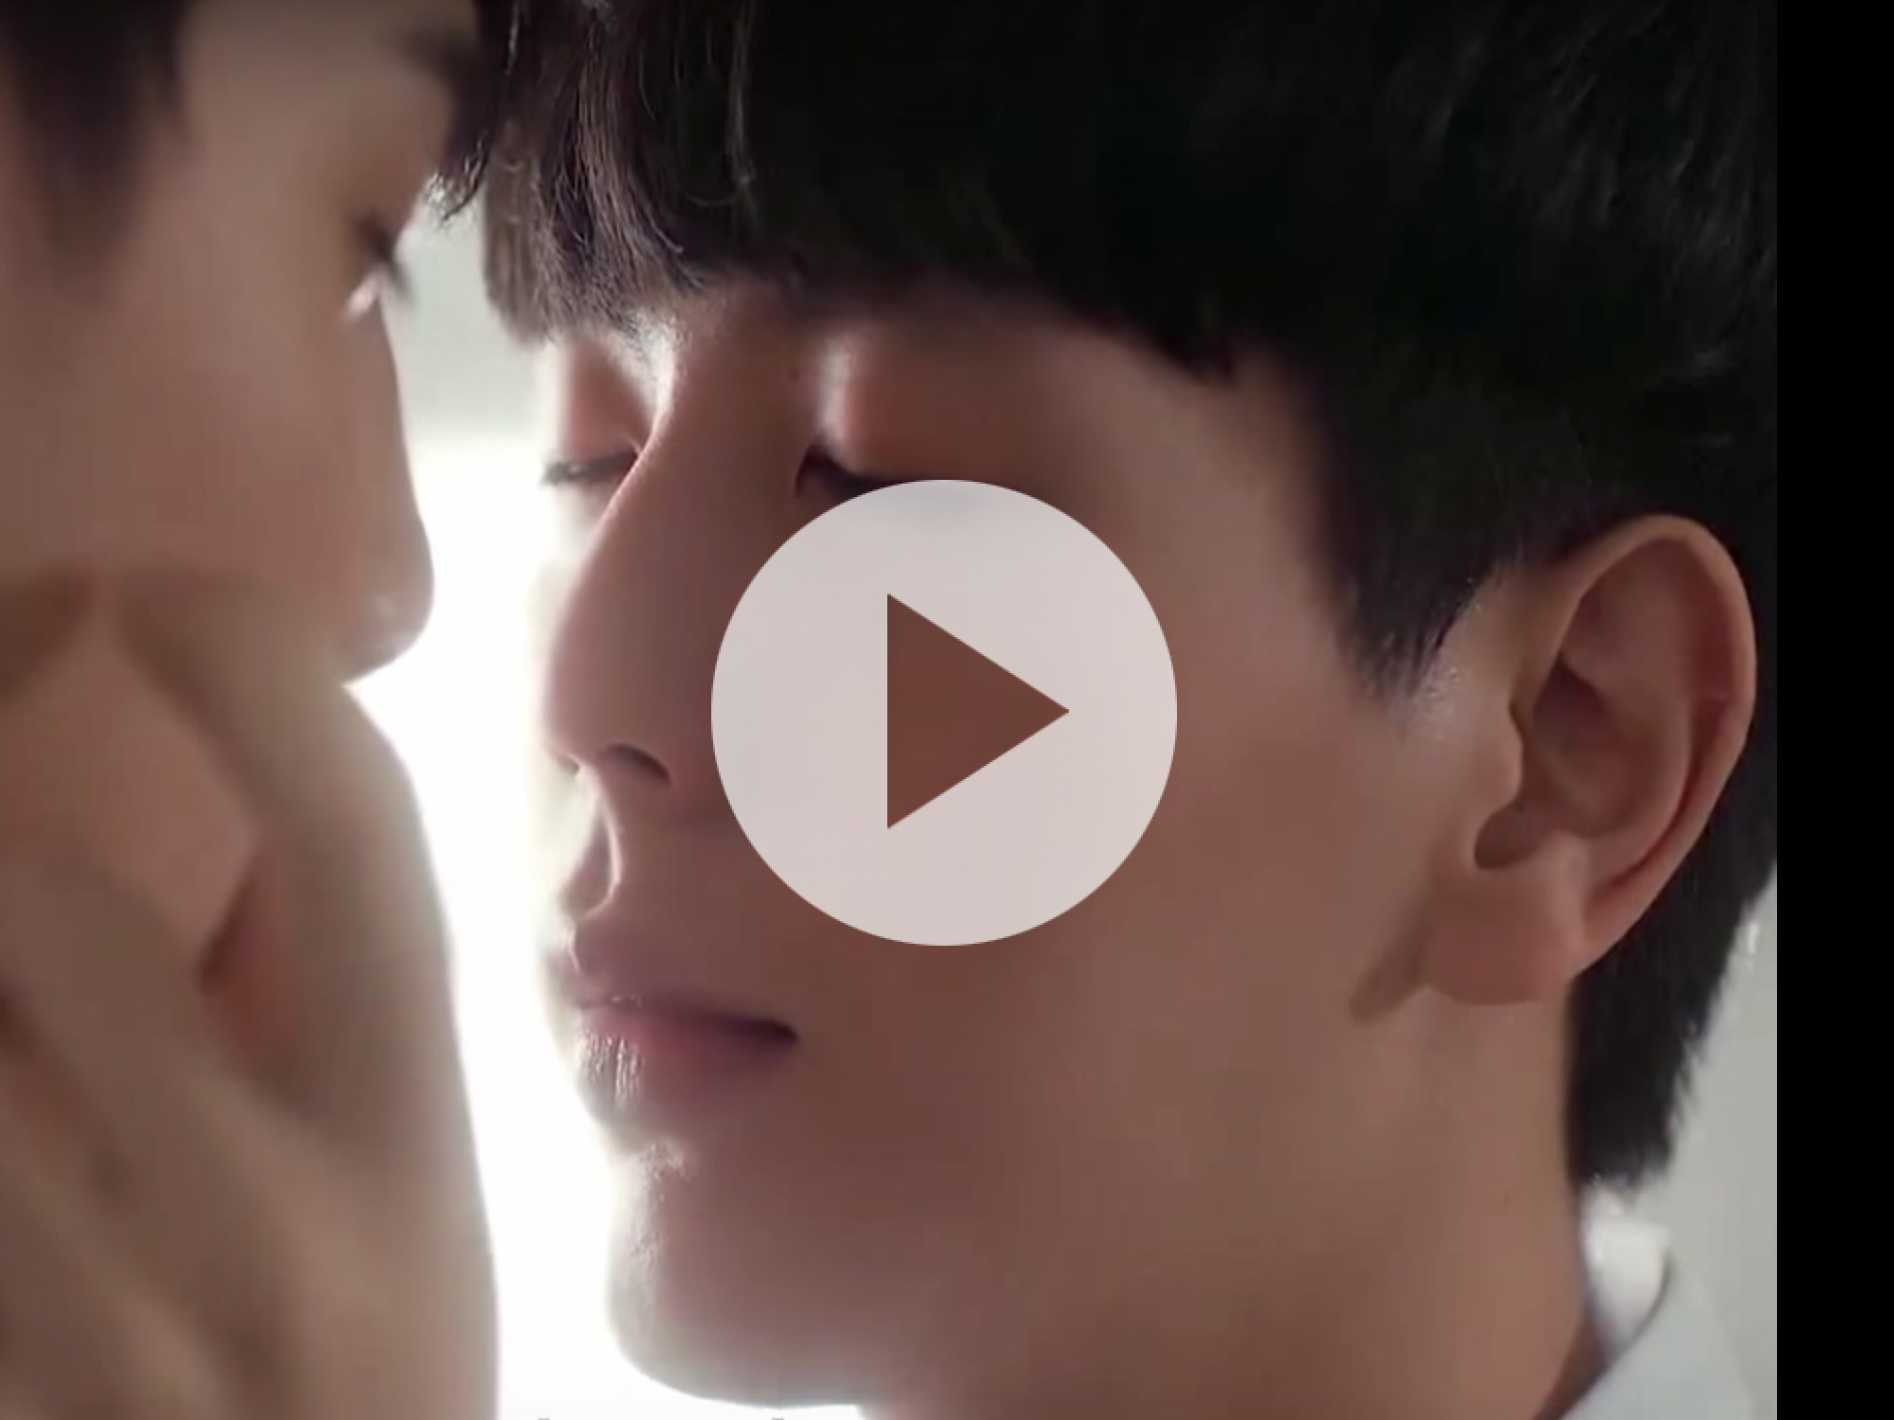 Thai Beauty Brand Makes a Splash With Its Boy-Centric Lip Balm